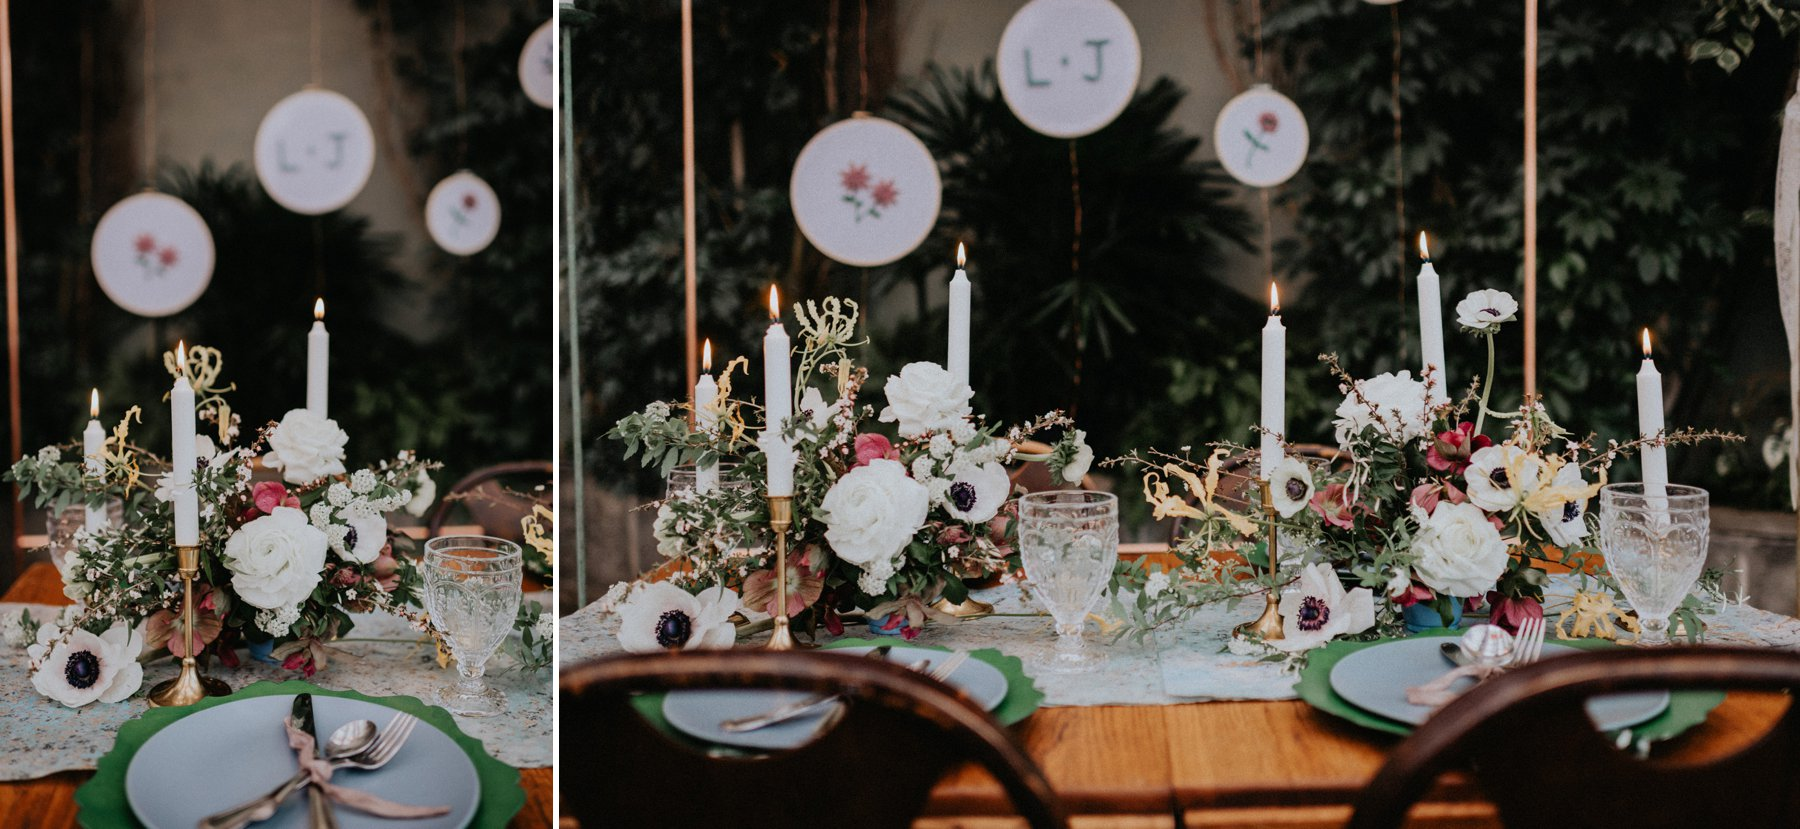 greenhouse-botanical-wedding-23.jpg